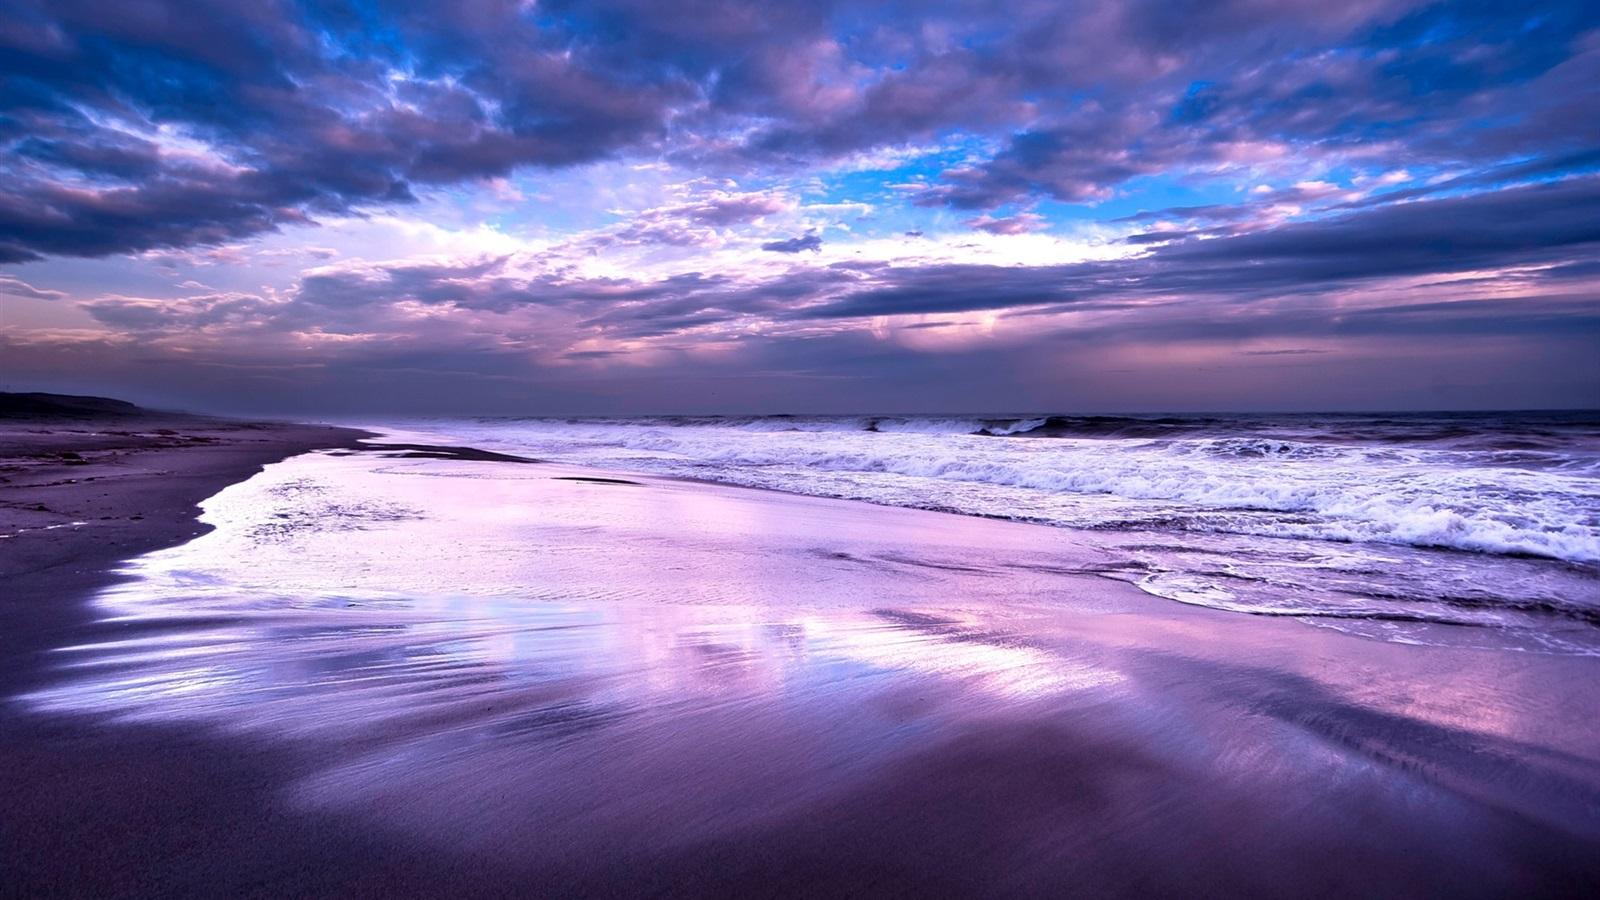 Wallpaper Sea Ocean Beach Night Sky Clouds Dusk 1920x1200 Hd